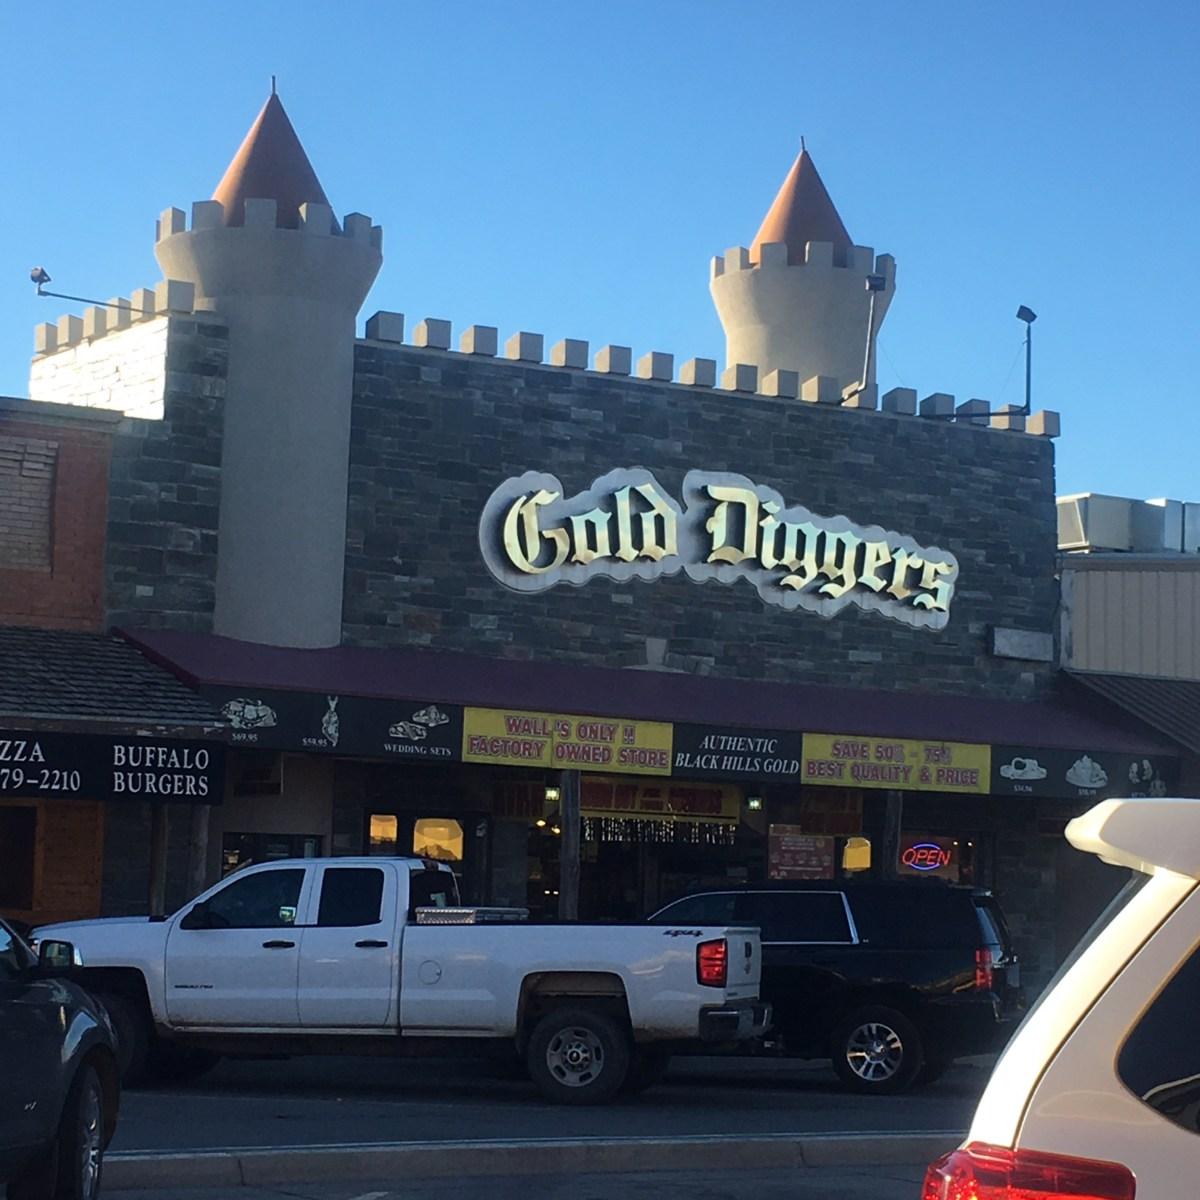 Gold Diggers Wall Drug South Dakota